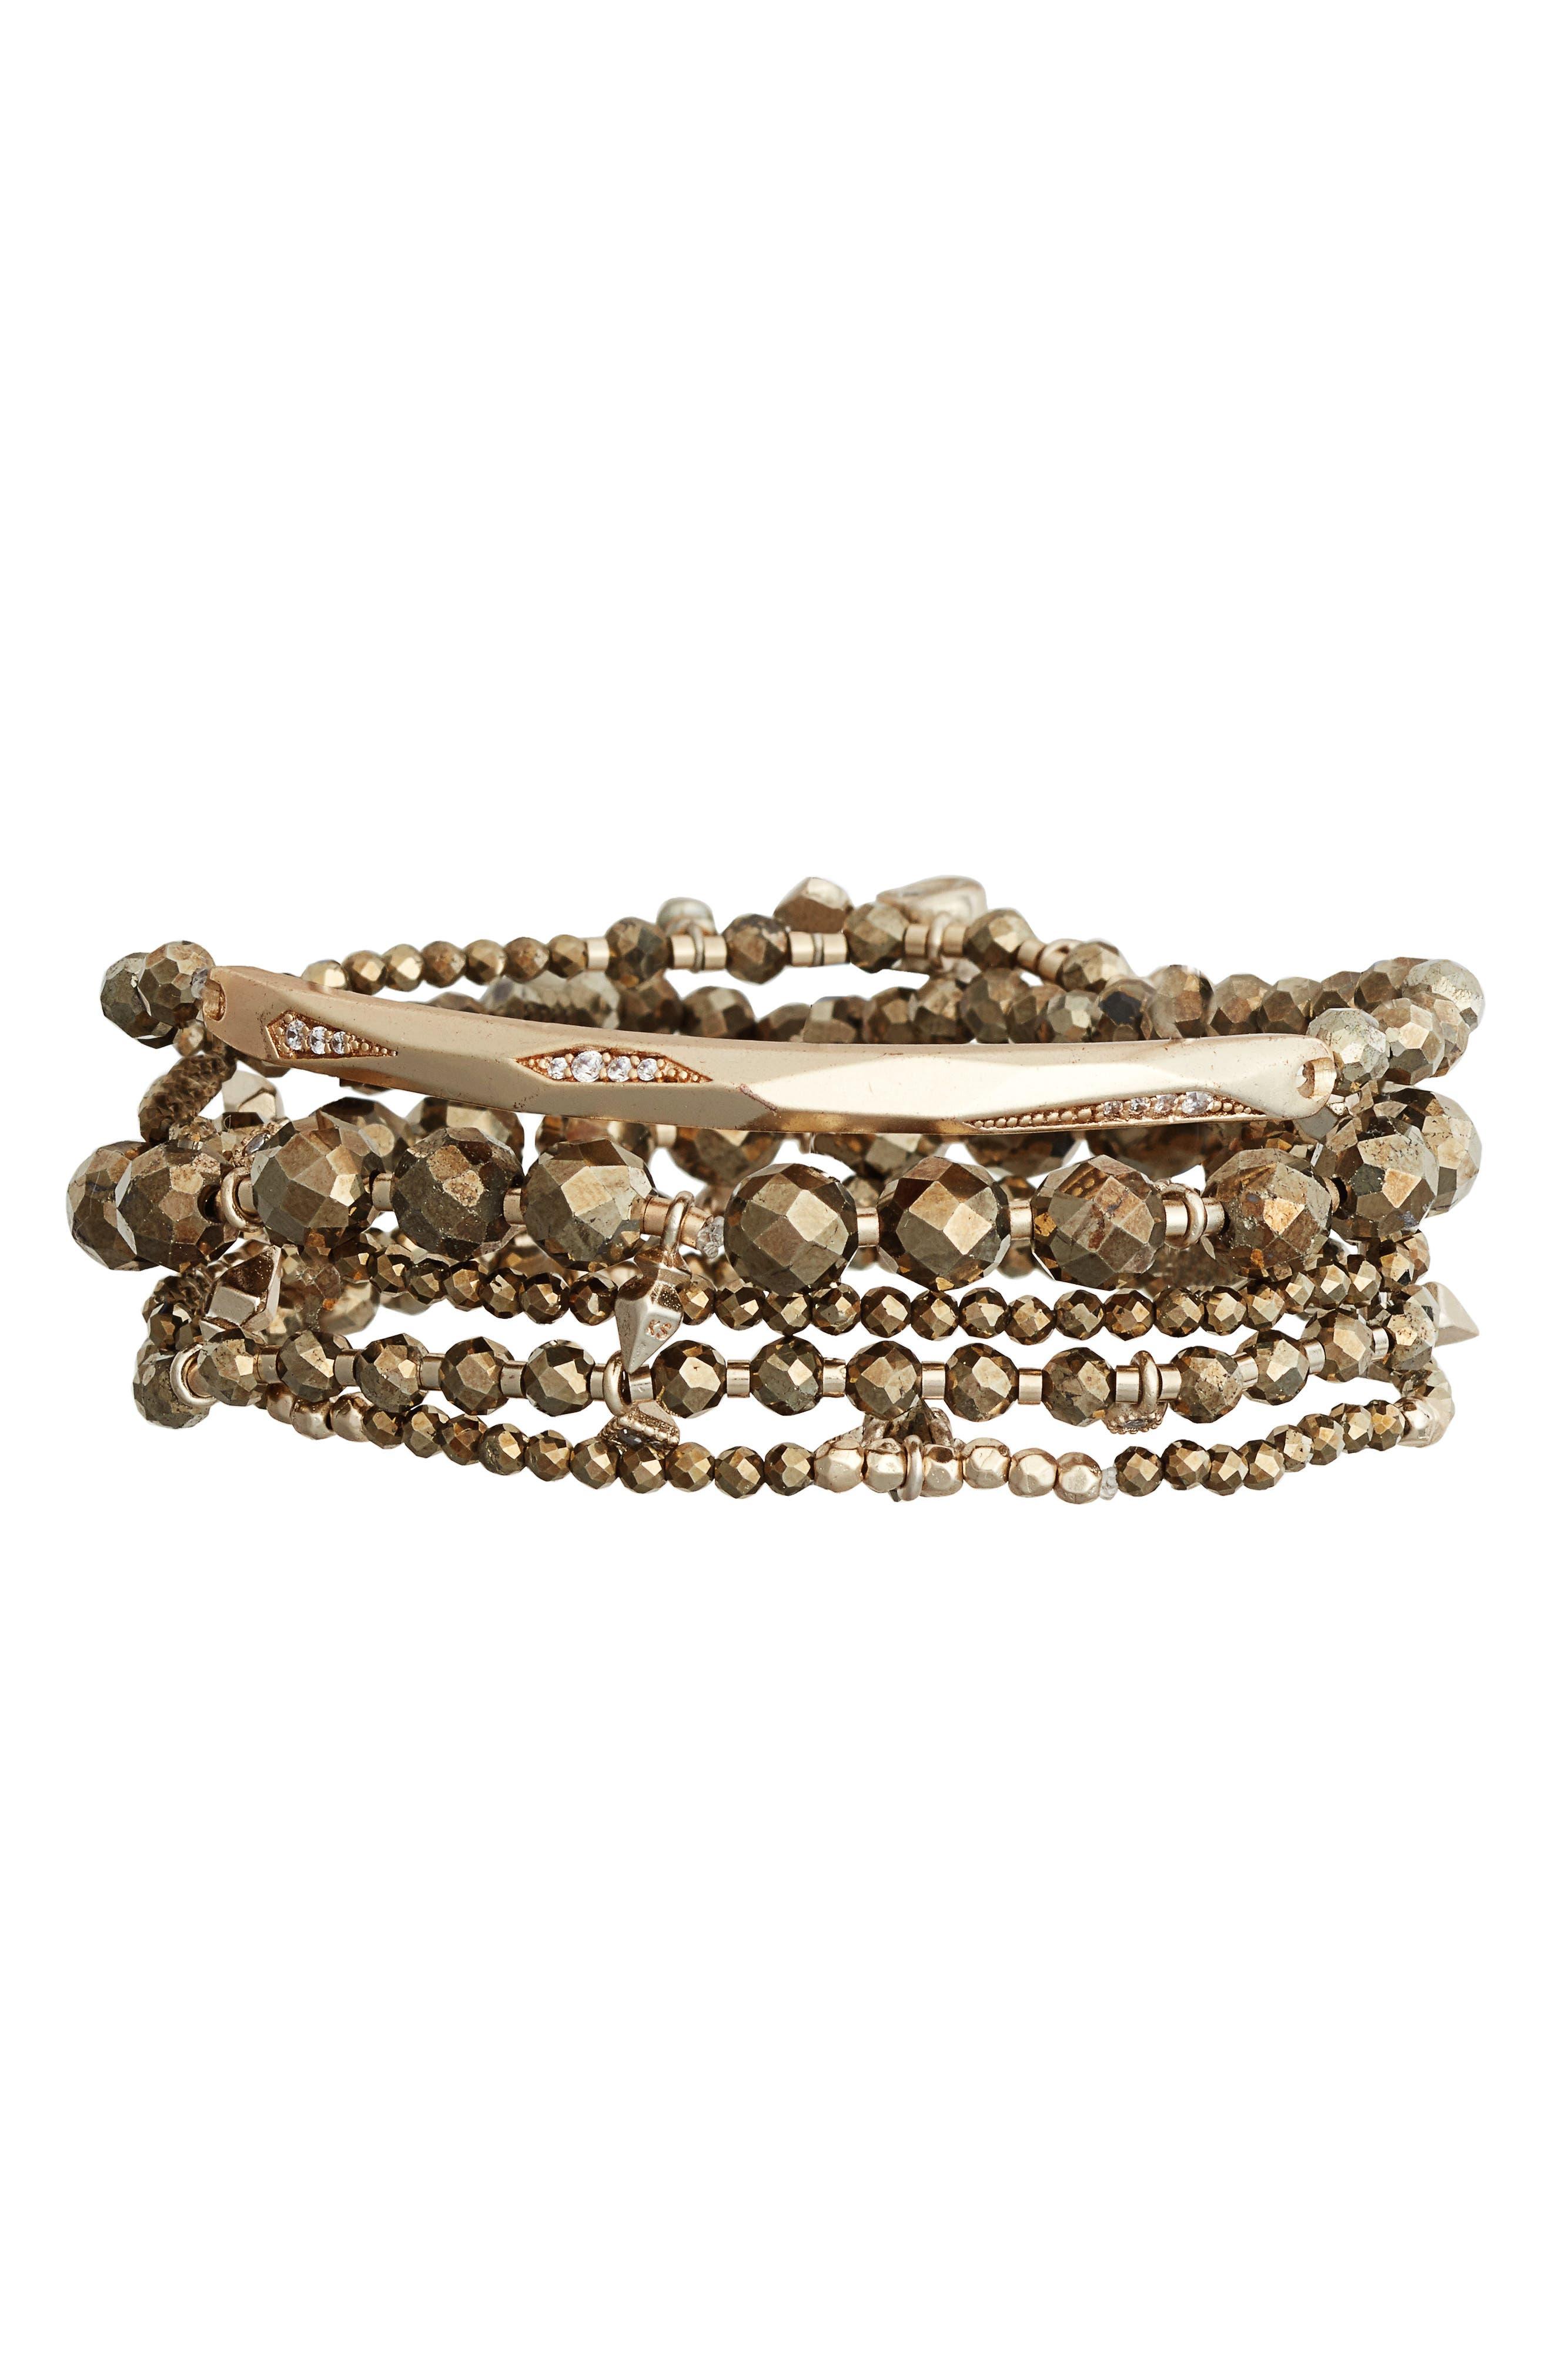 Kendra Scott Supak Set of 5 Bracelets